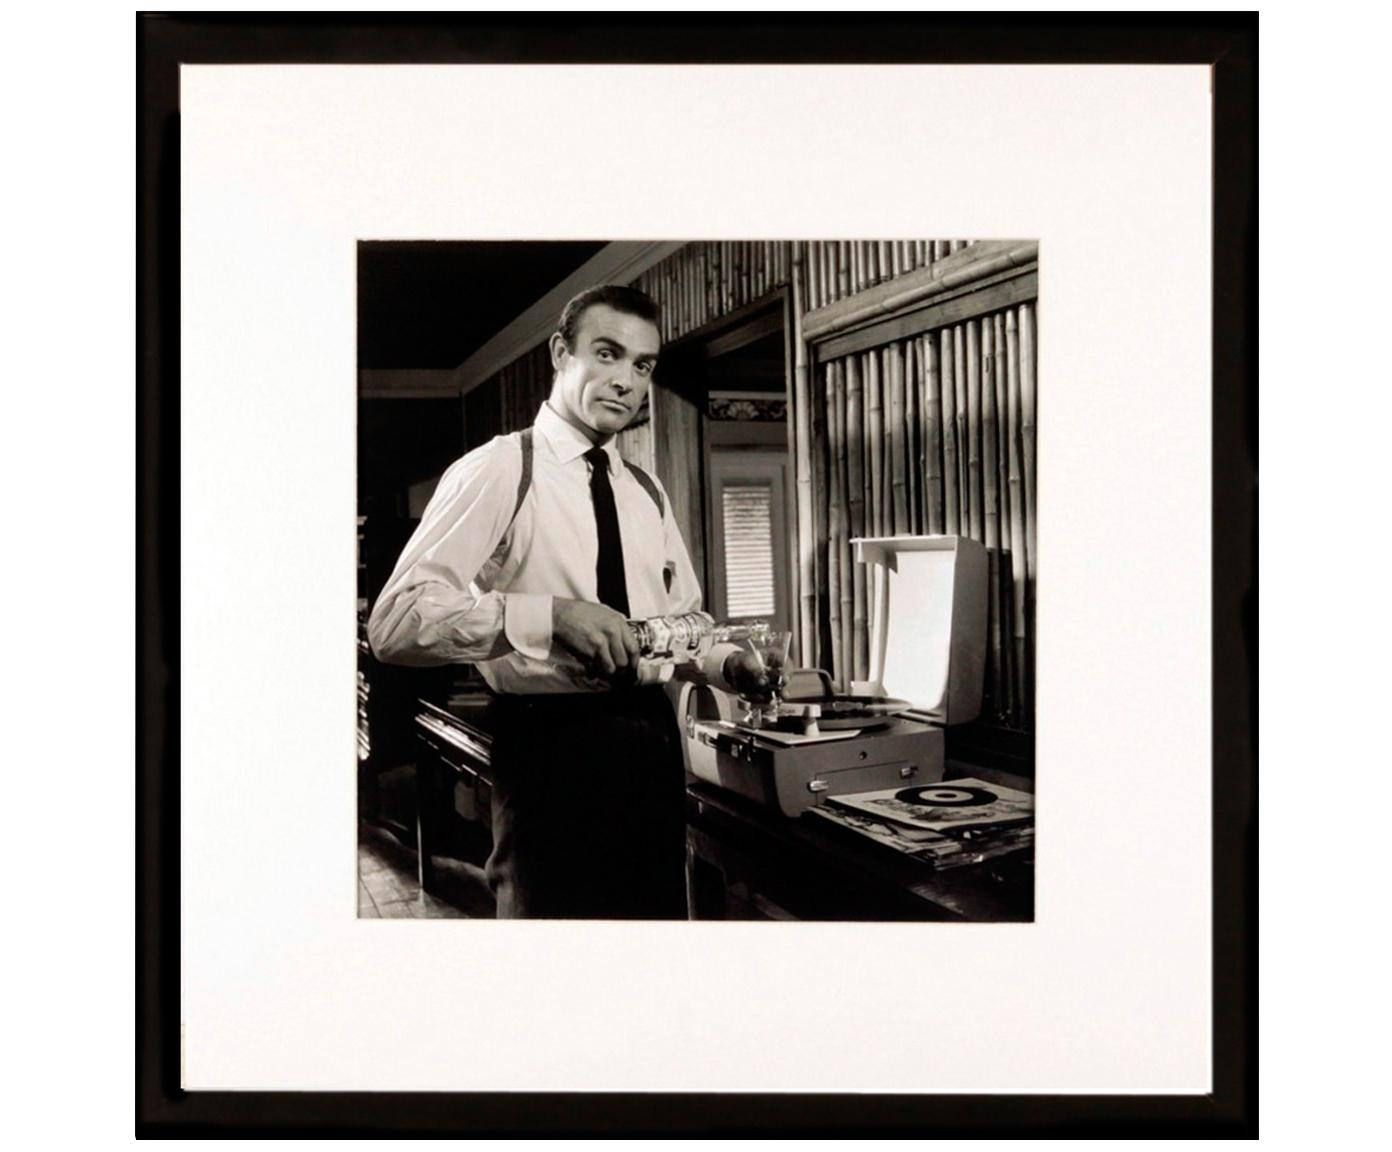 Impresión digital enmarcada Connery, Ilustración: negro, blanco Marco: negro, An 40 x Al 40 cm